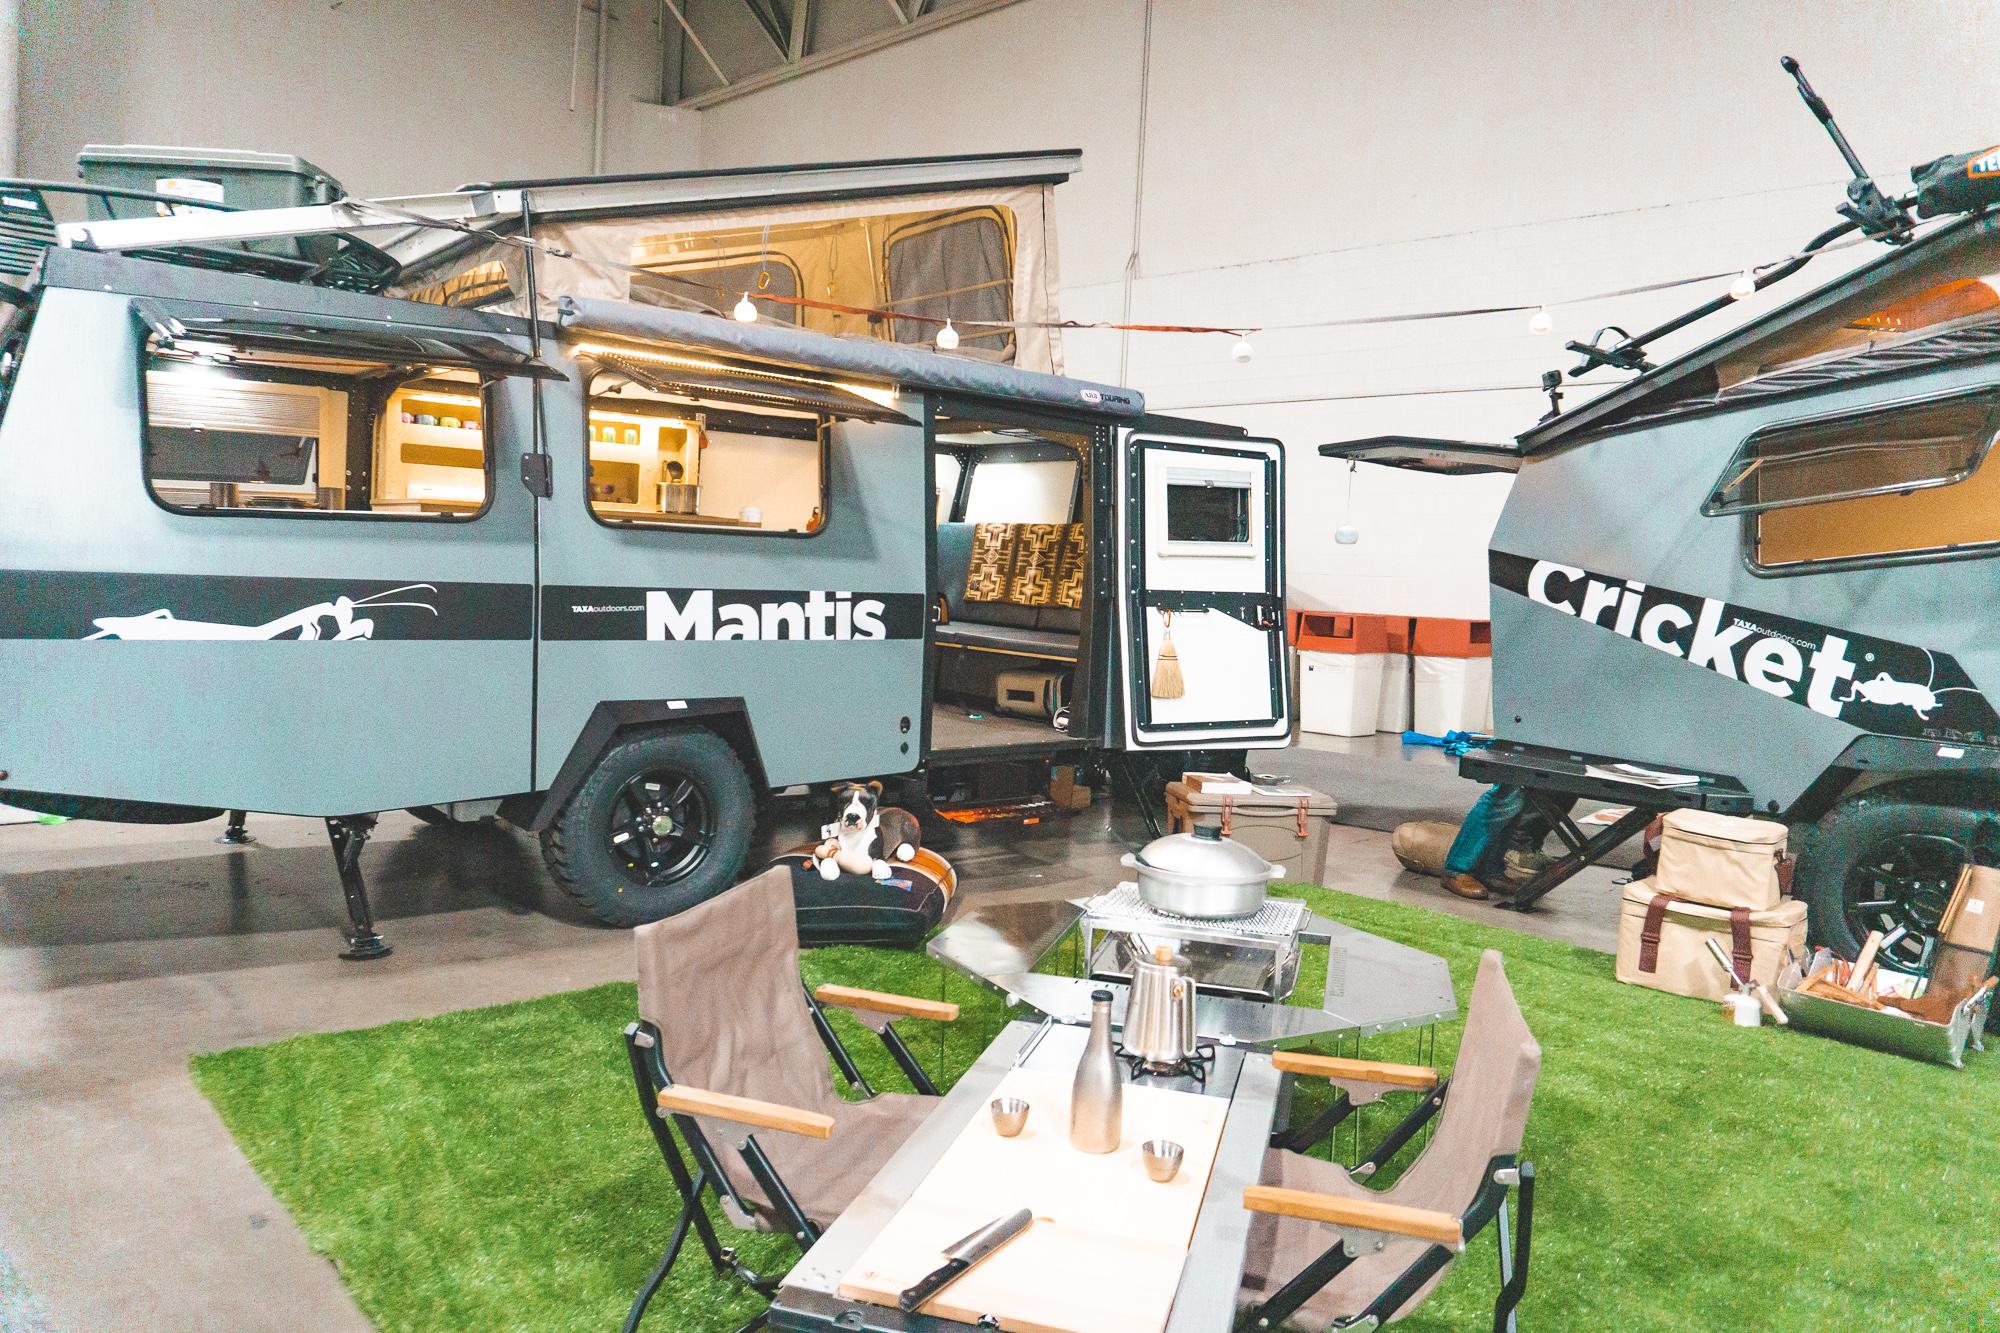 TAXA RV camper trailer at RVX - ochristine